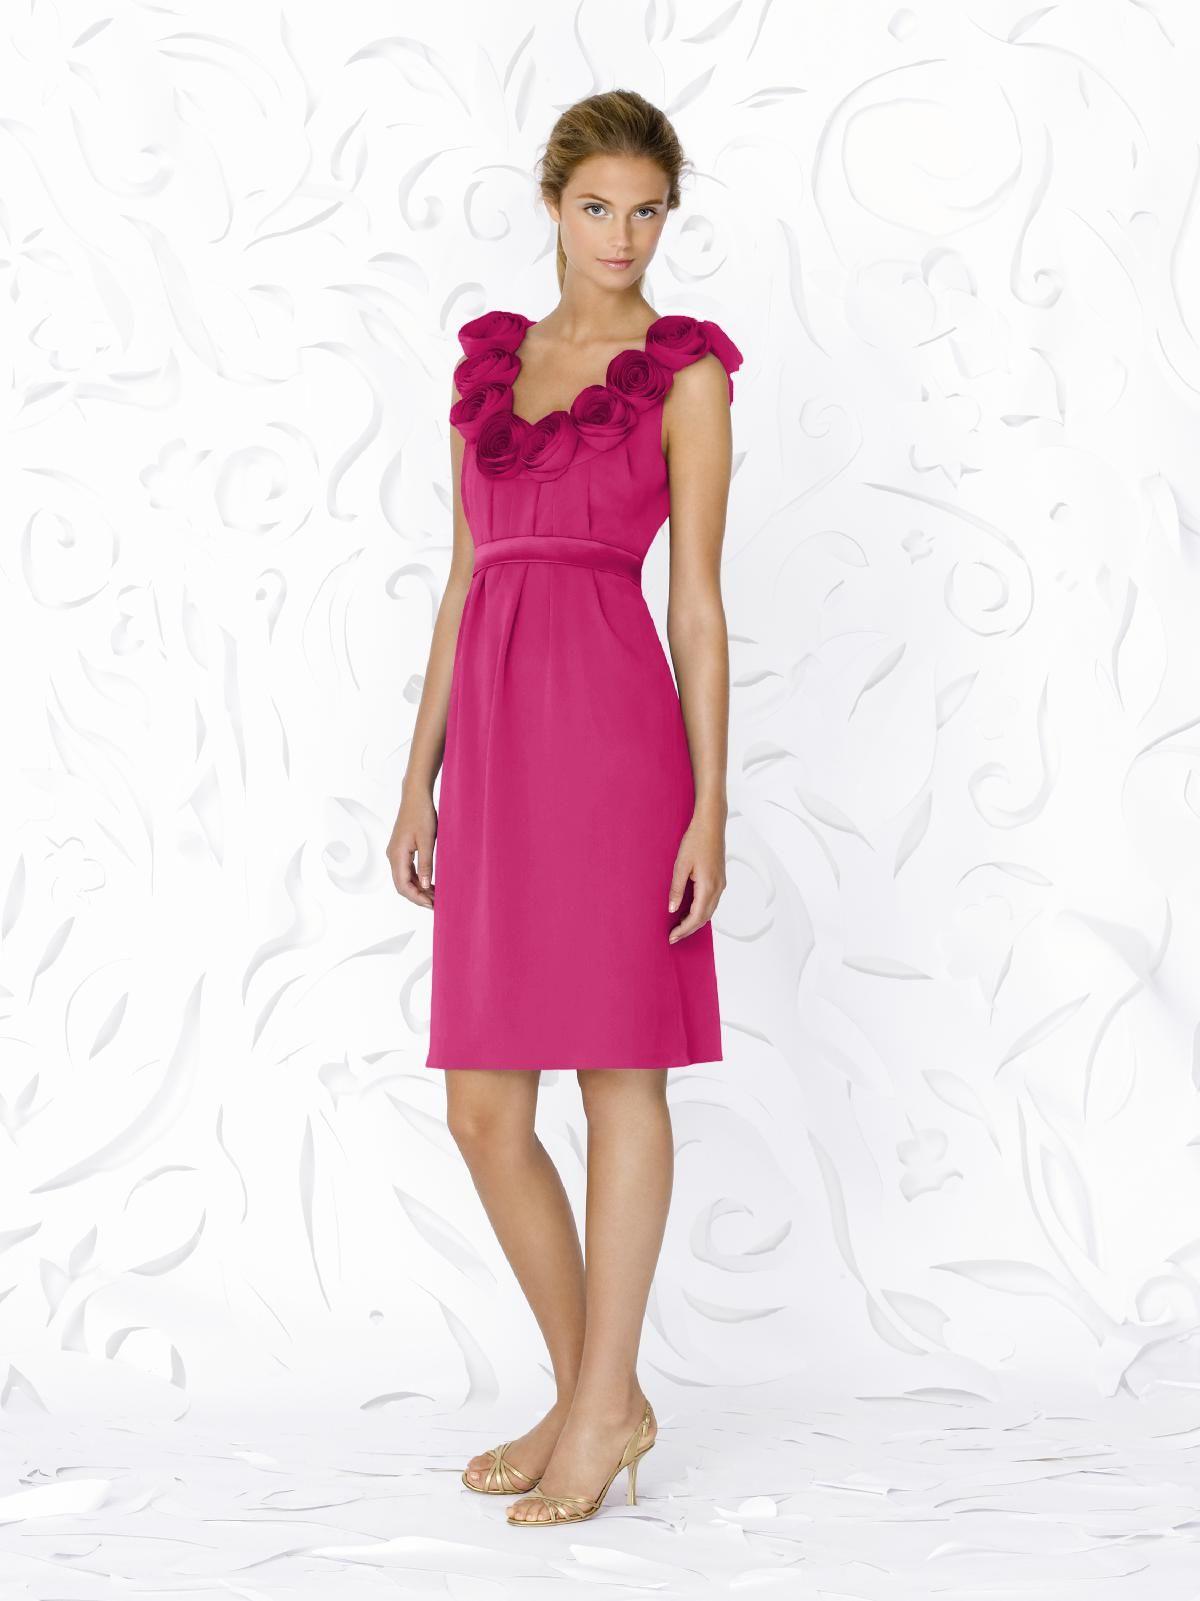 Lela Rose Style LR102: The Dessy Group   Bridesmaids   Pinterest